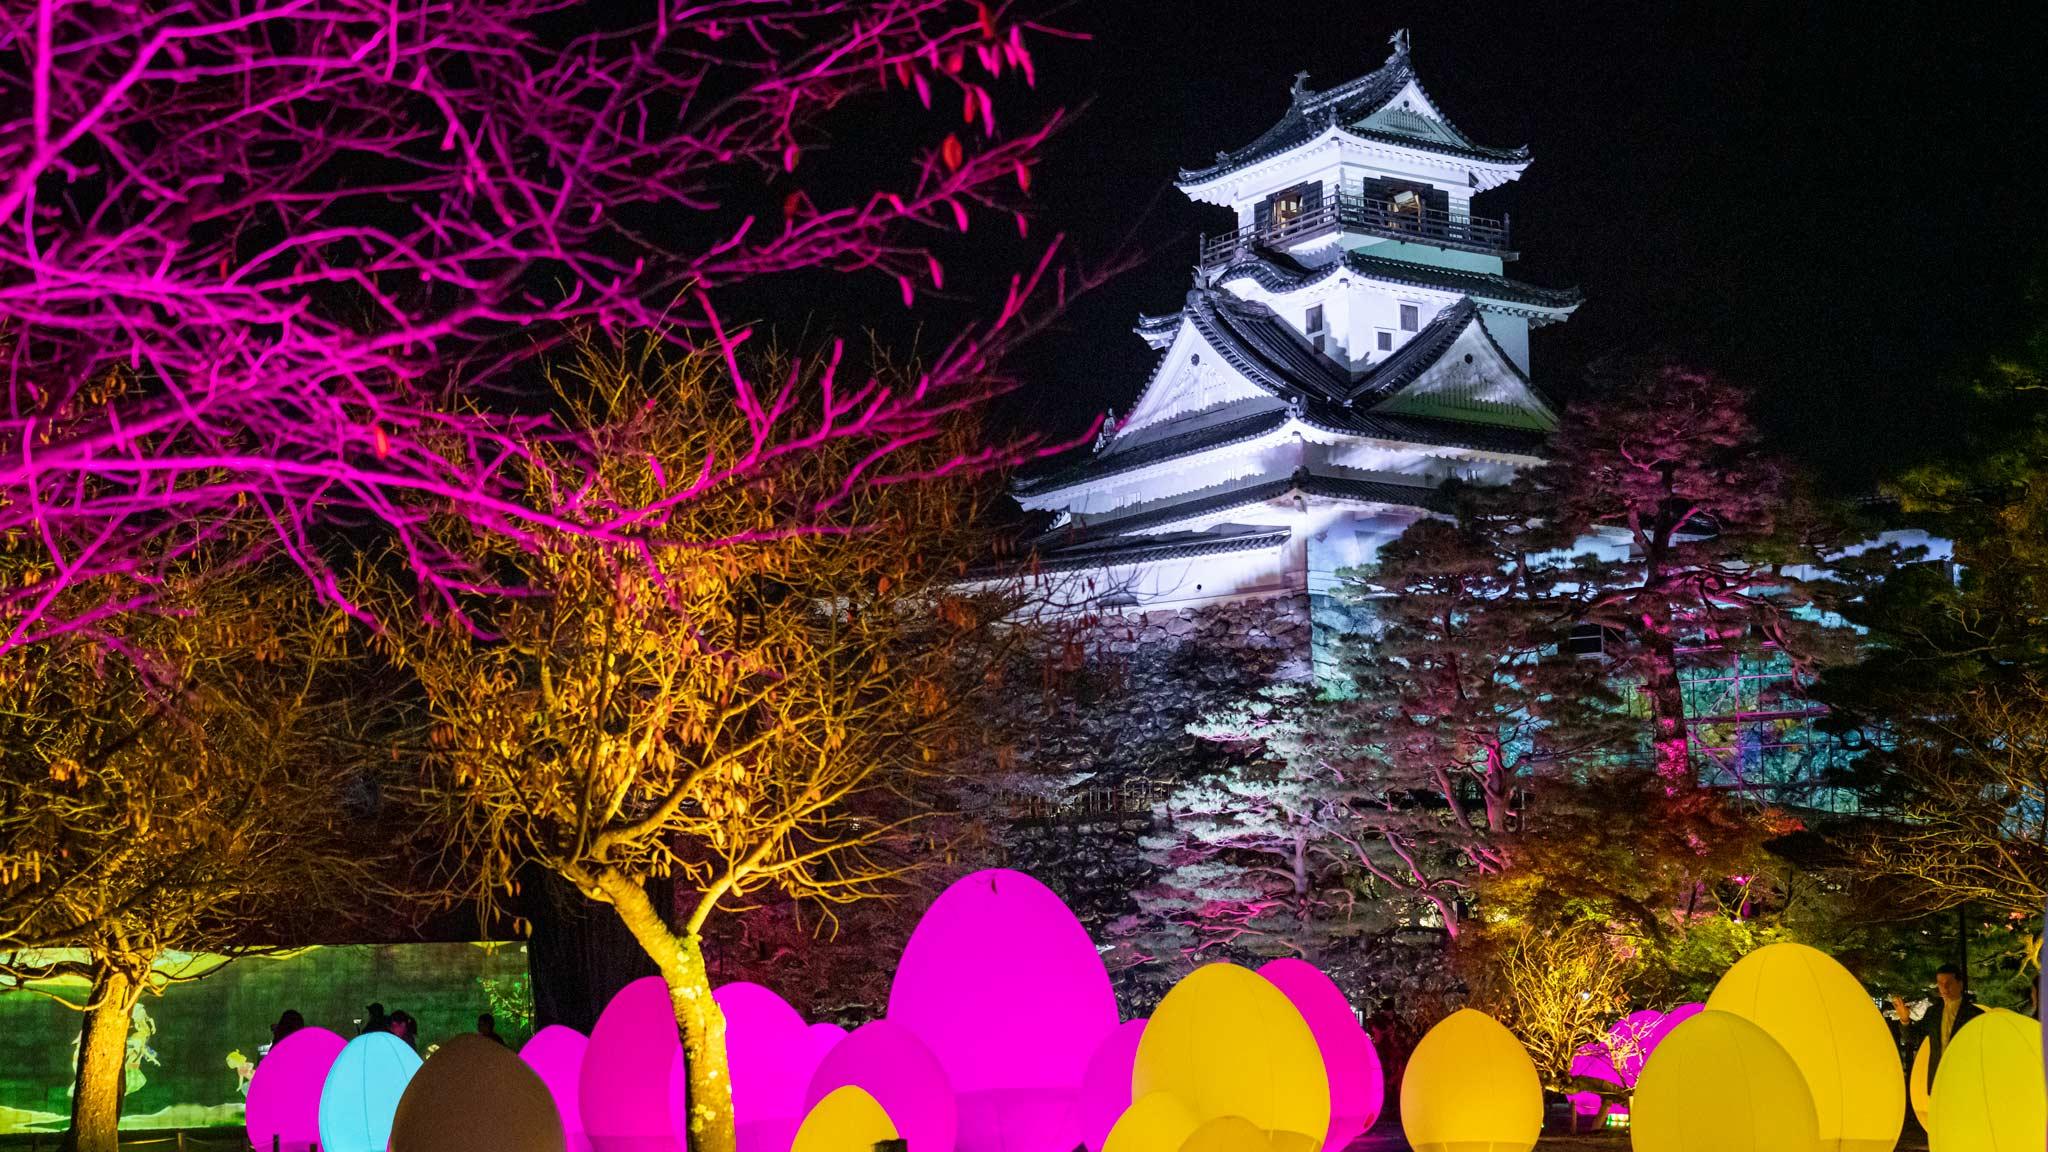 Kochi Castle TeamLab Digital Art